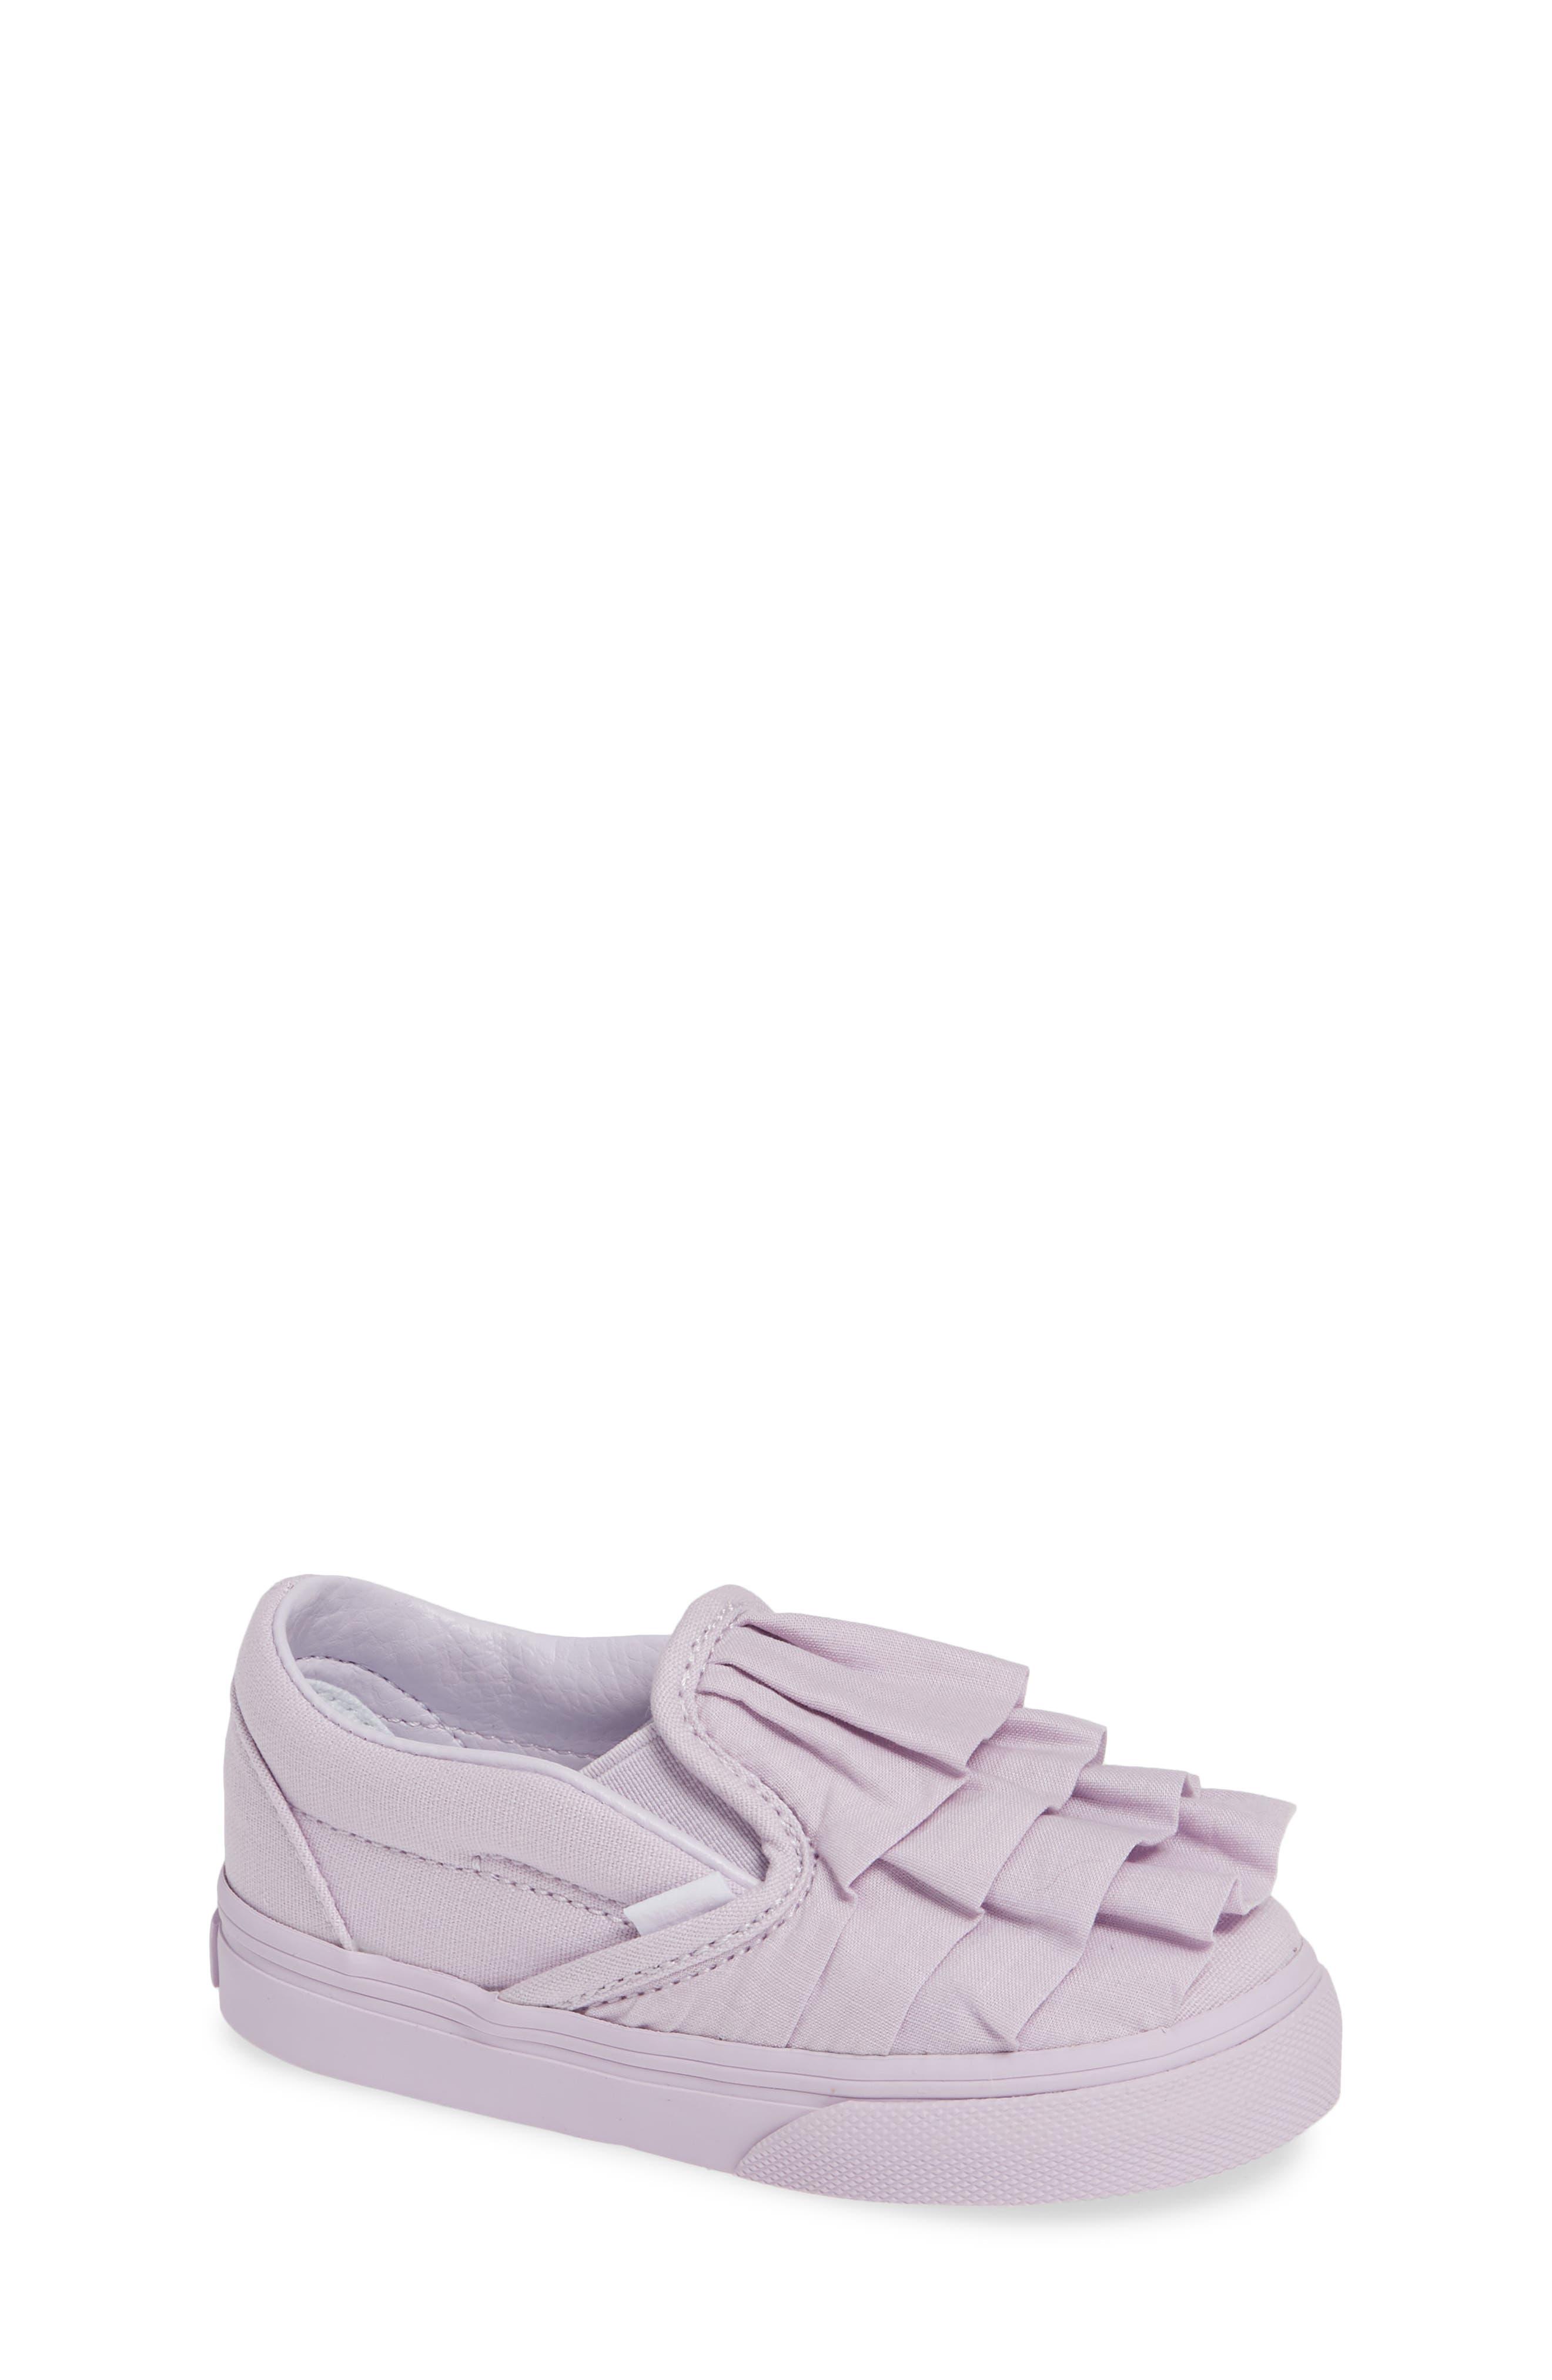 Ruffle Classic Slip-On Sneaker, Main, color, 530